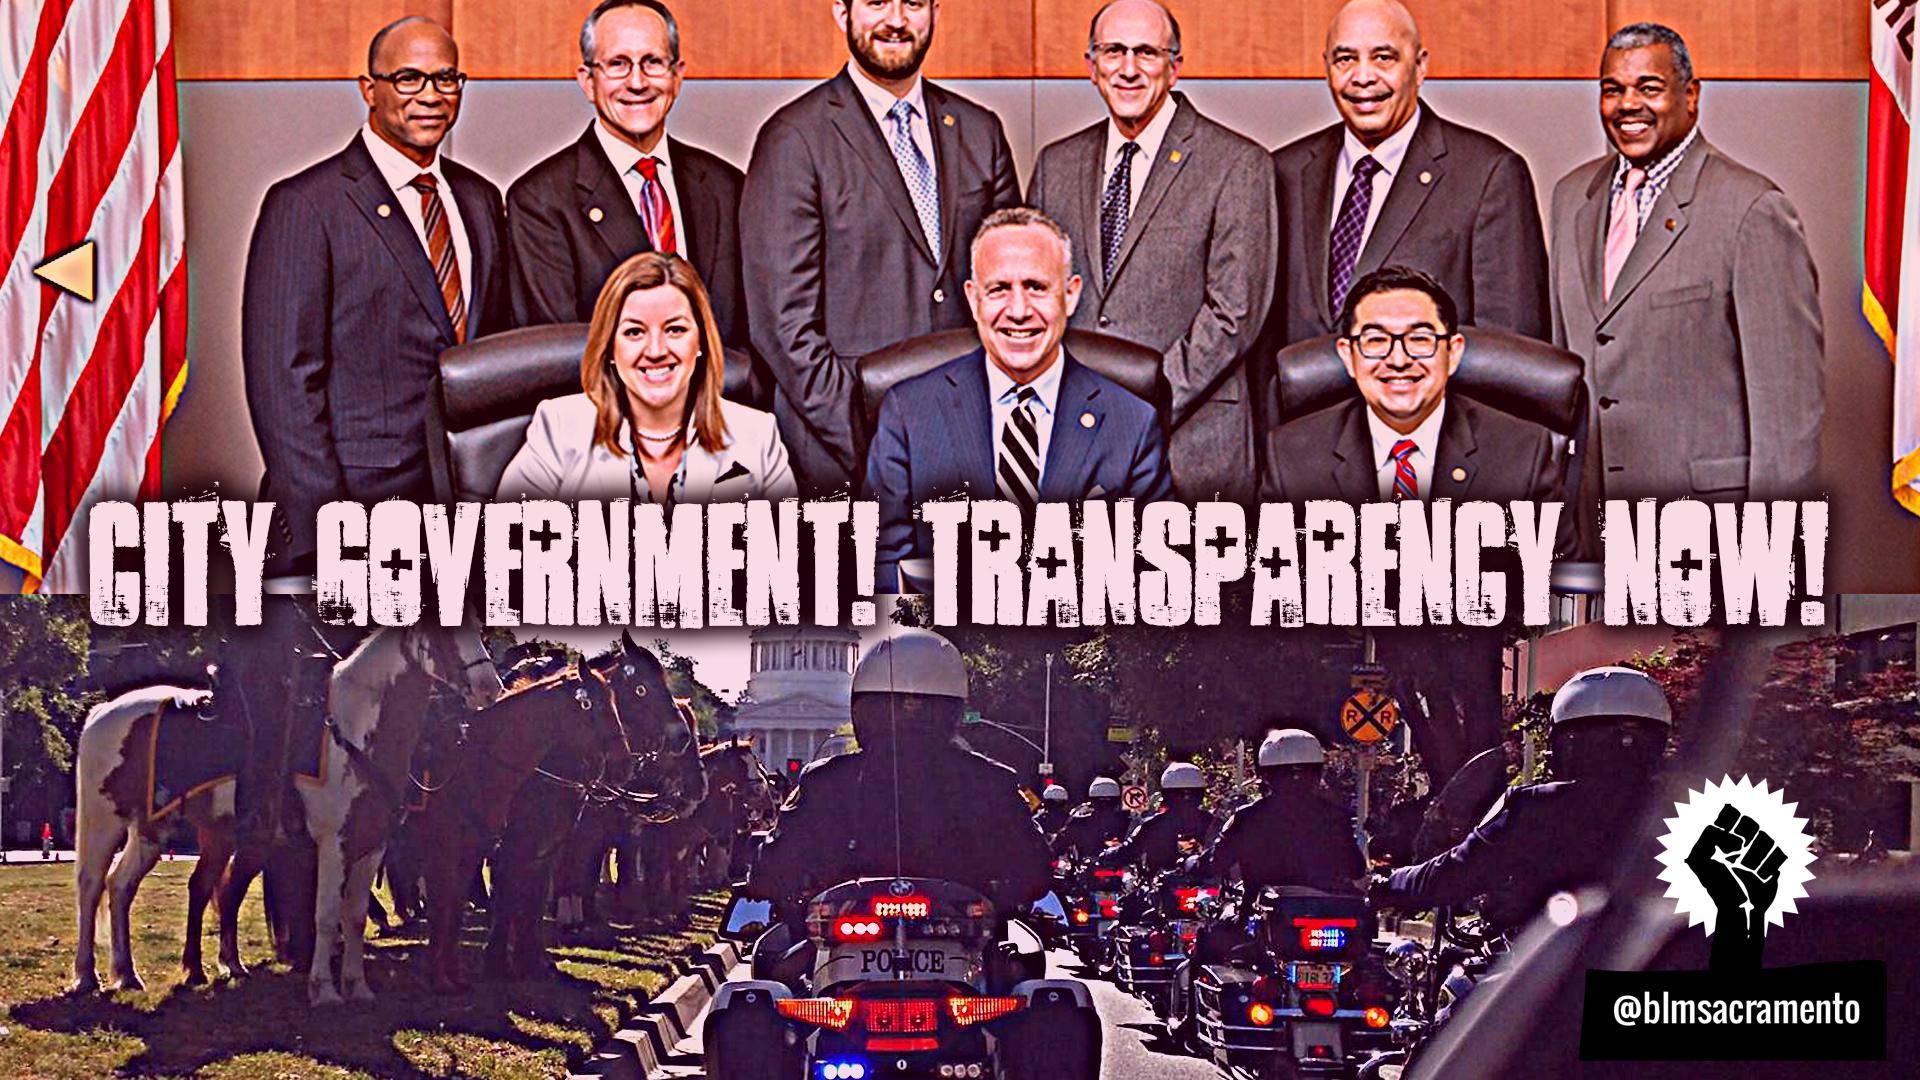 CityGovtTransparencyNow.jpg